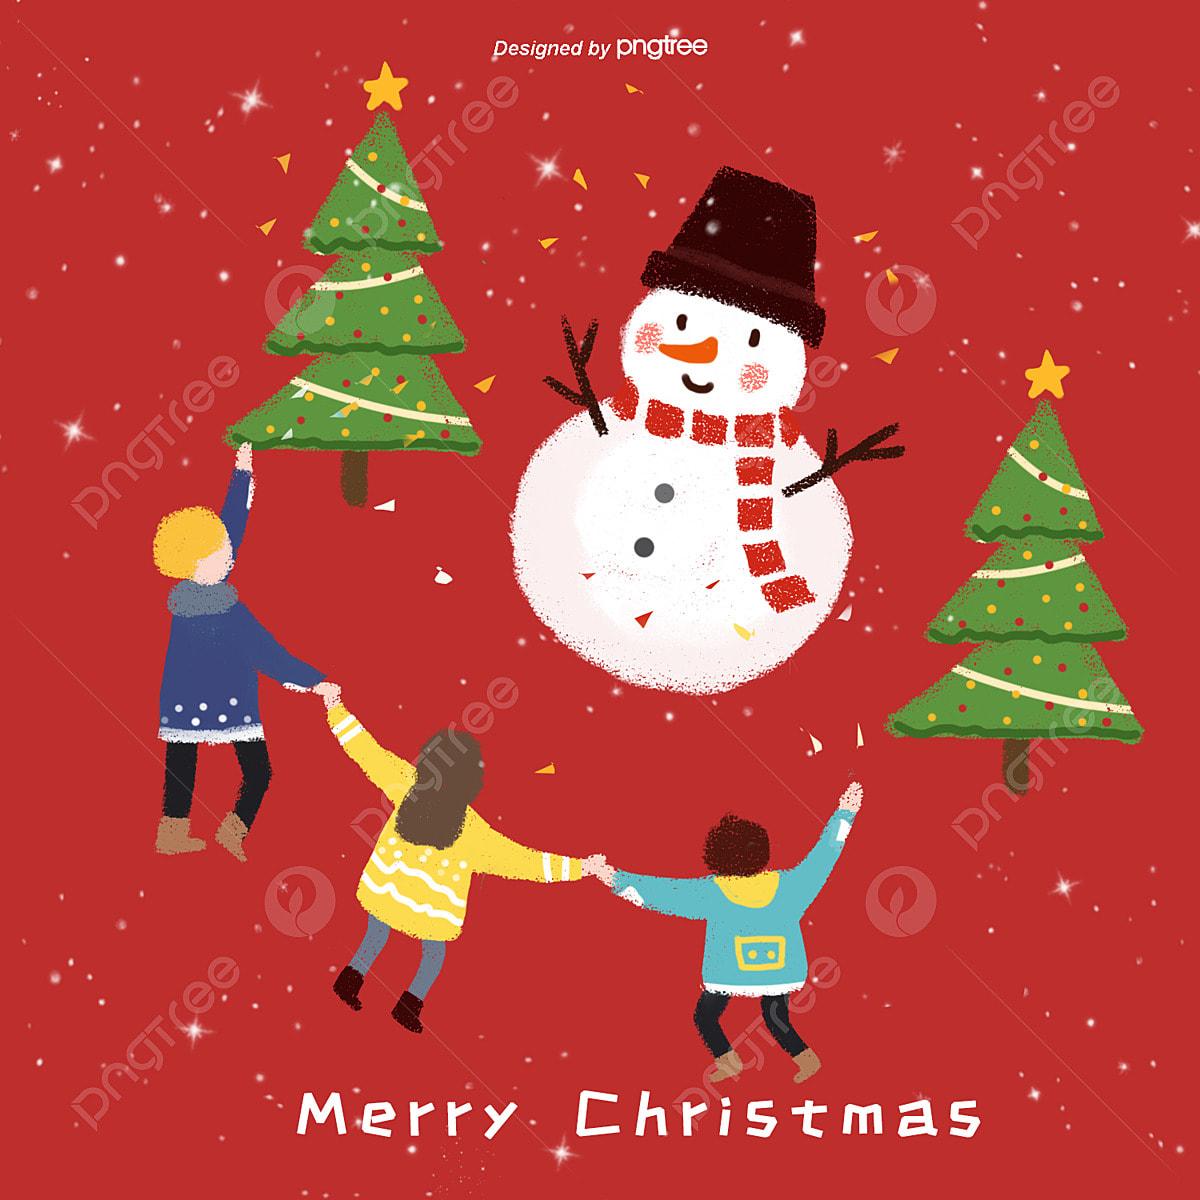 Christmas Celebration Cartoon Images.Cute Snowman Christmas Celebration With Children Cartoon